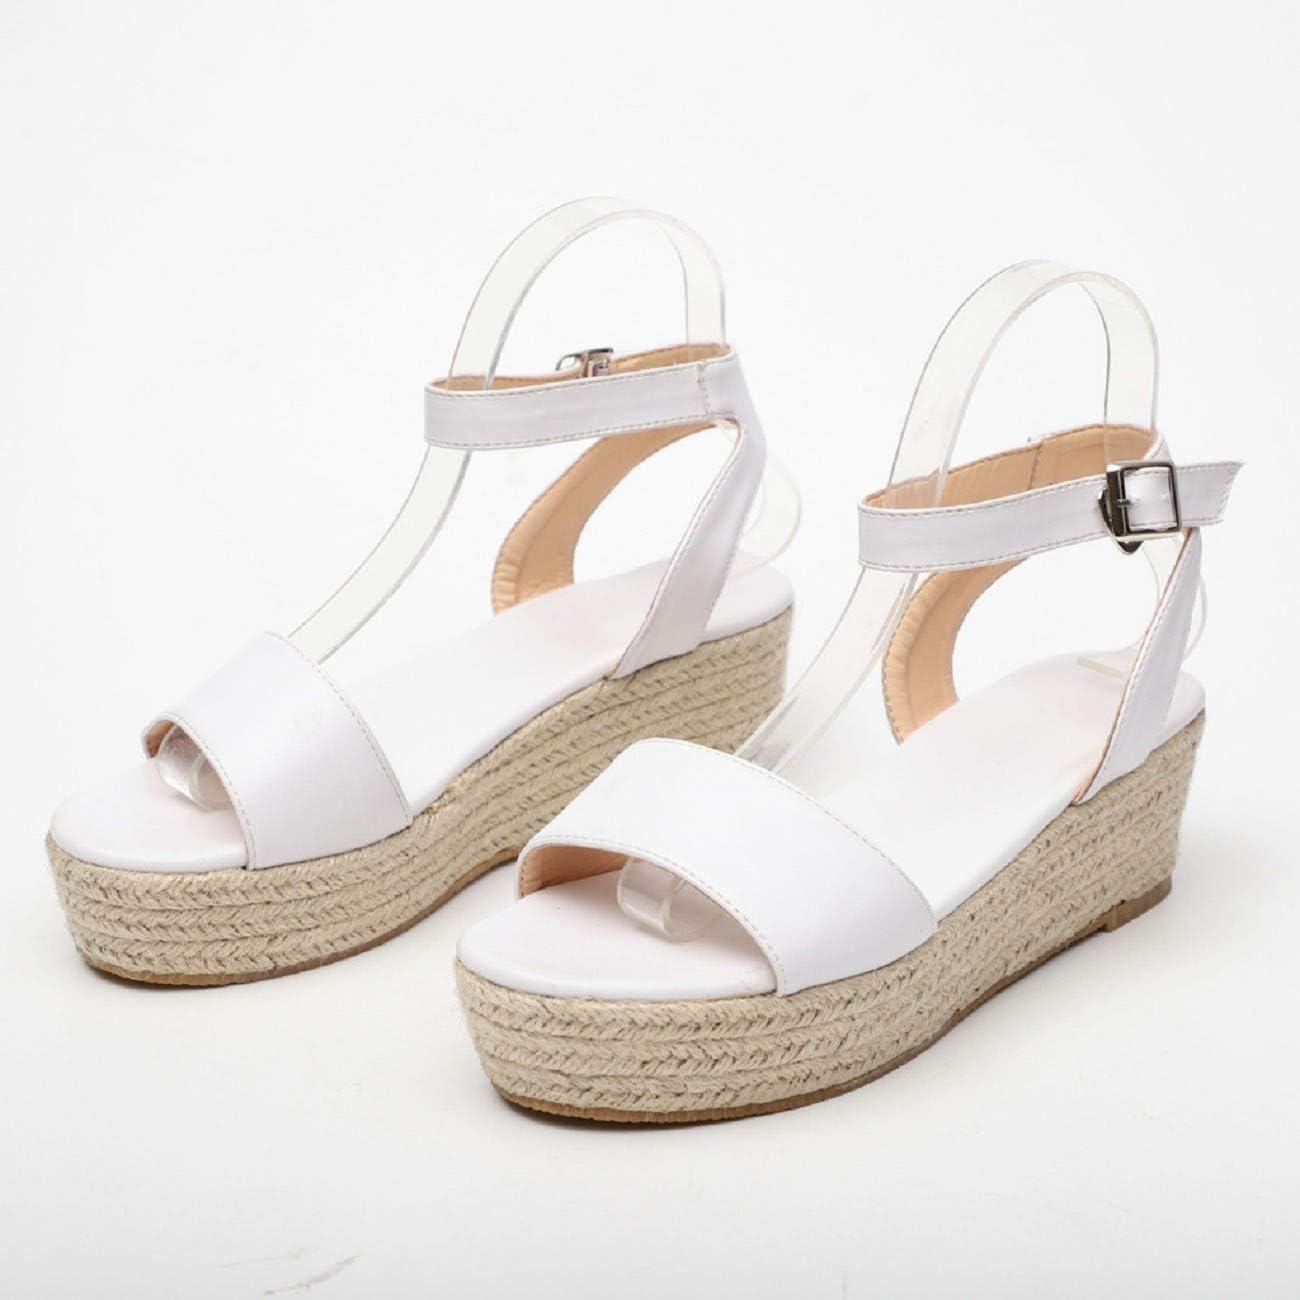 FAPIZI Ladies Summer Espadrille Heel Platform Wedge Sandals Ankle Buckle Closed Toe Shoes Women High Wedges Sandals